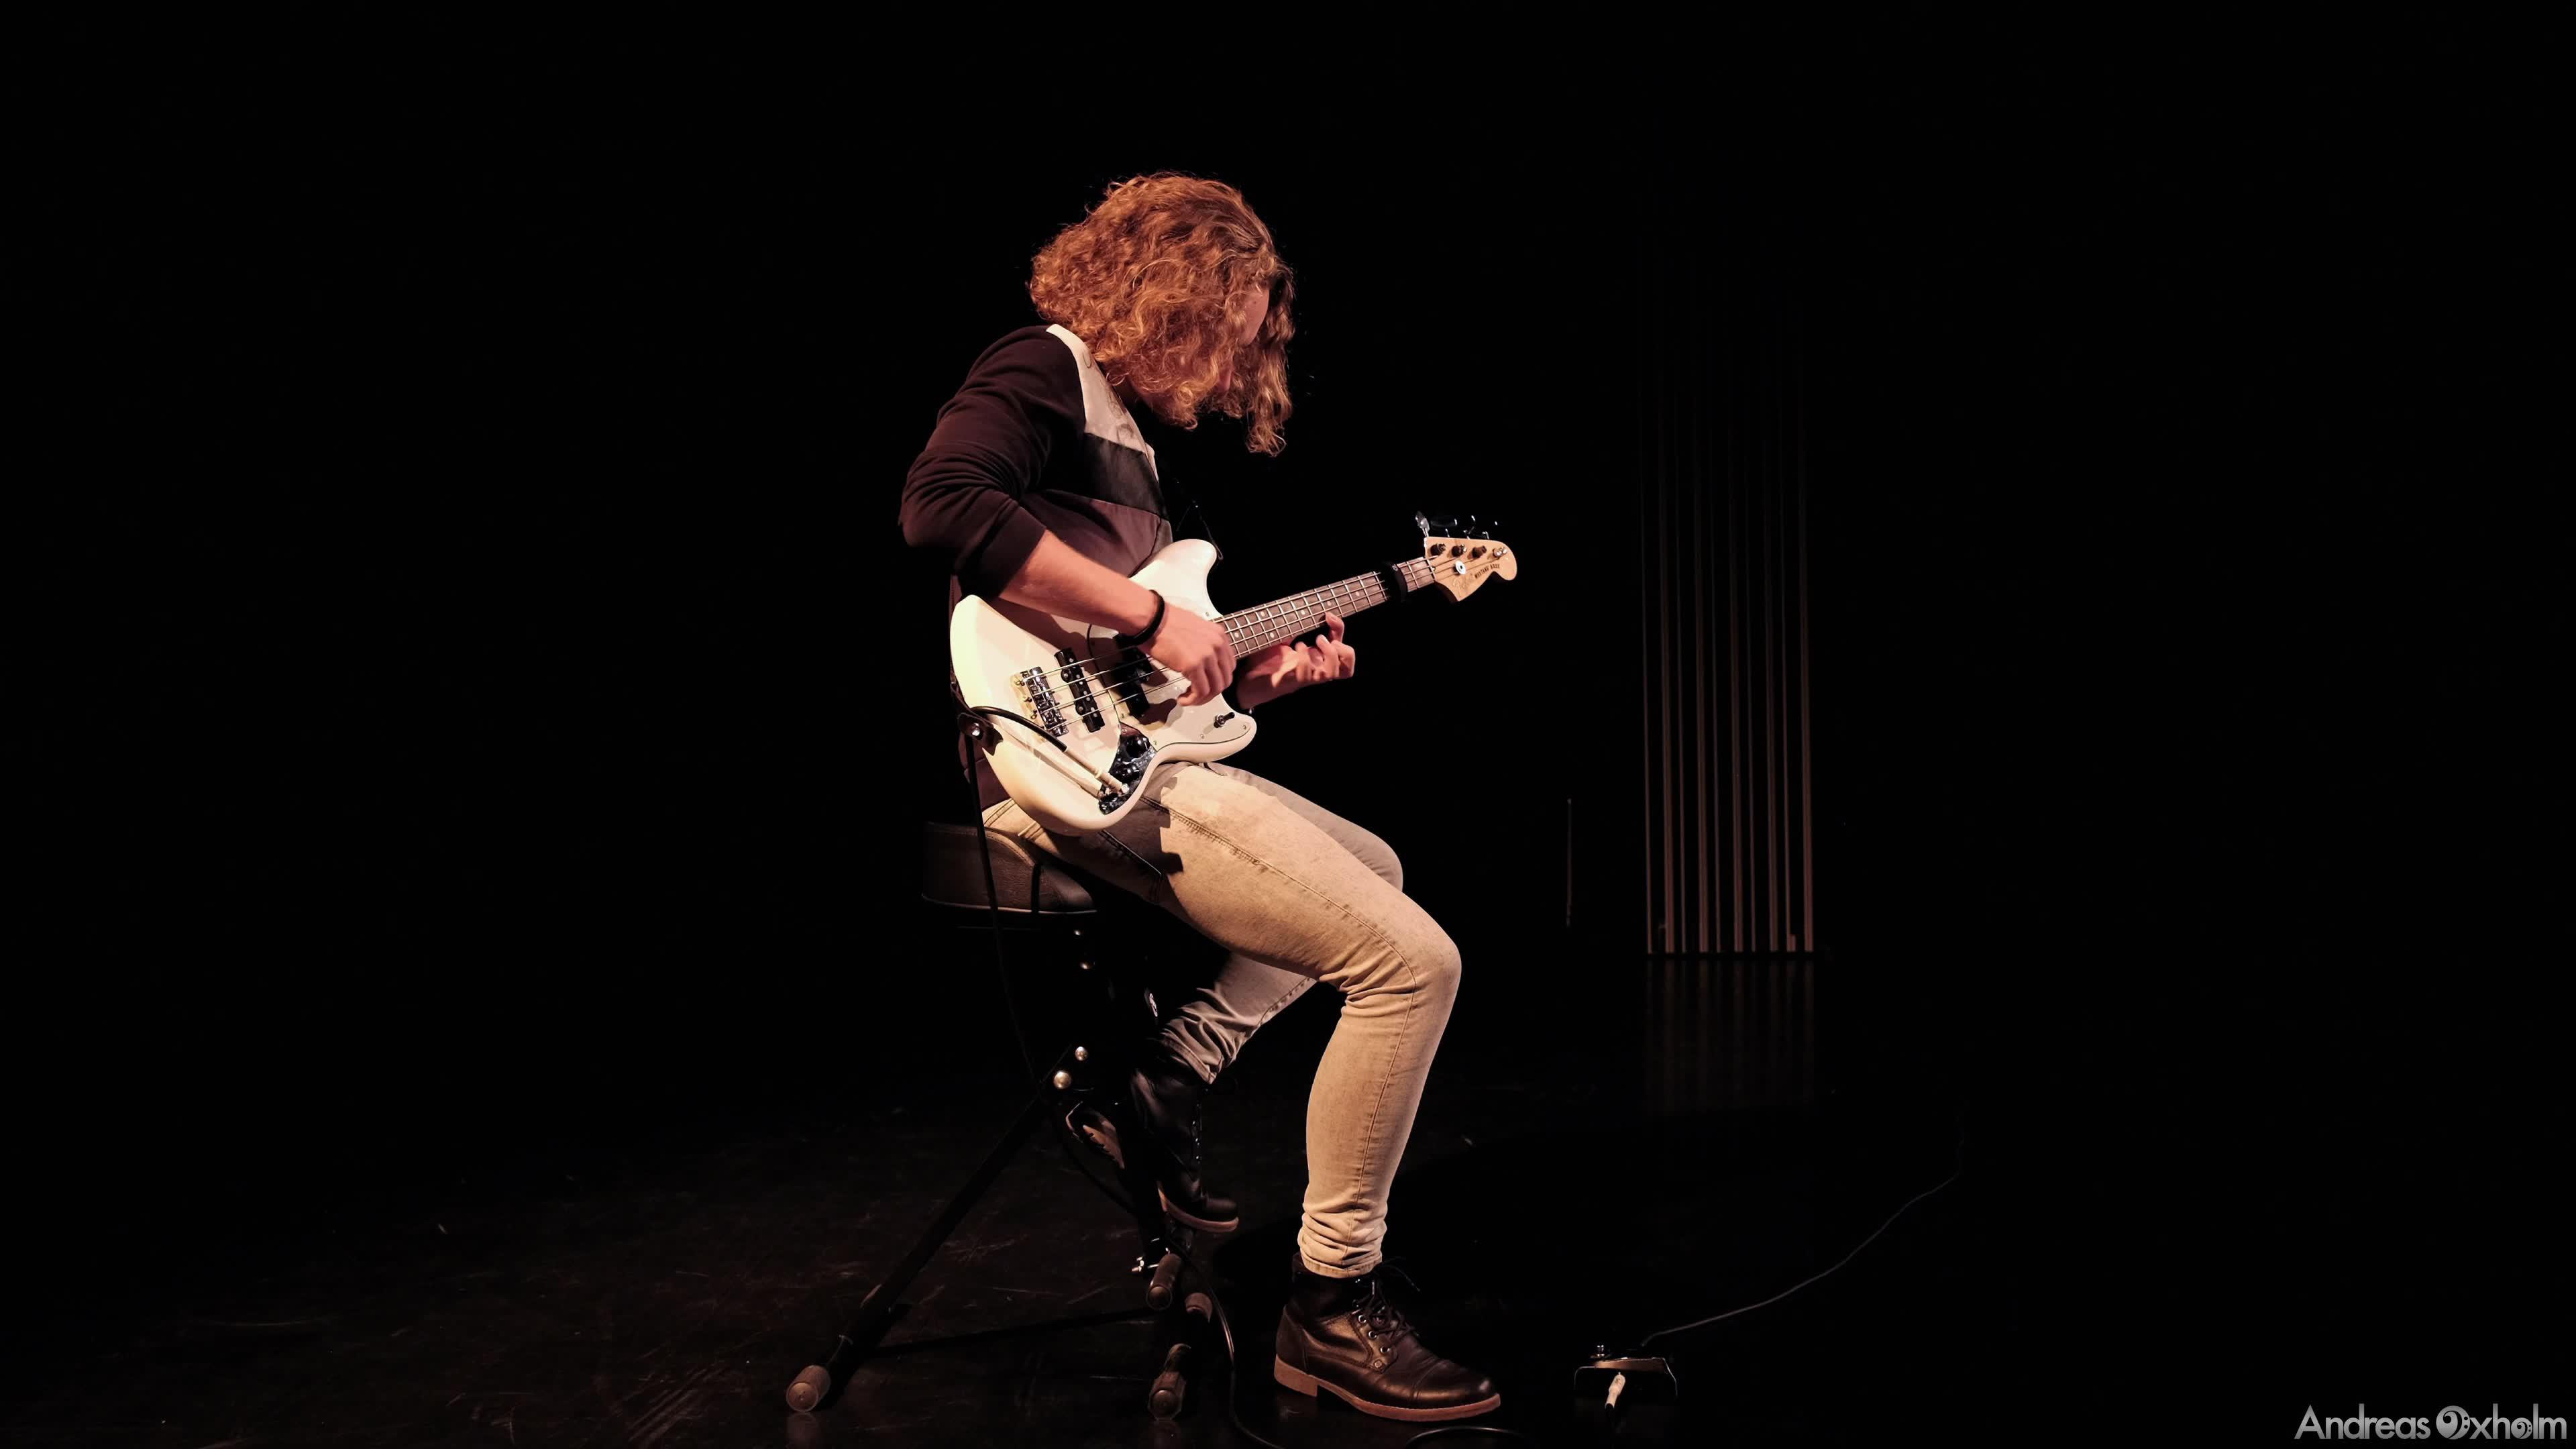 Relapse (Live) by Andreas Oxholm @ Kon-Tiki Auditorium